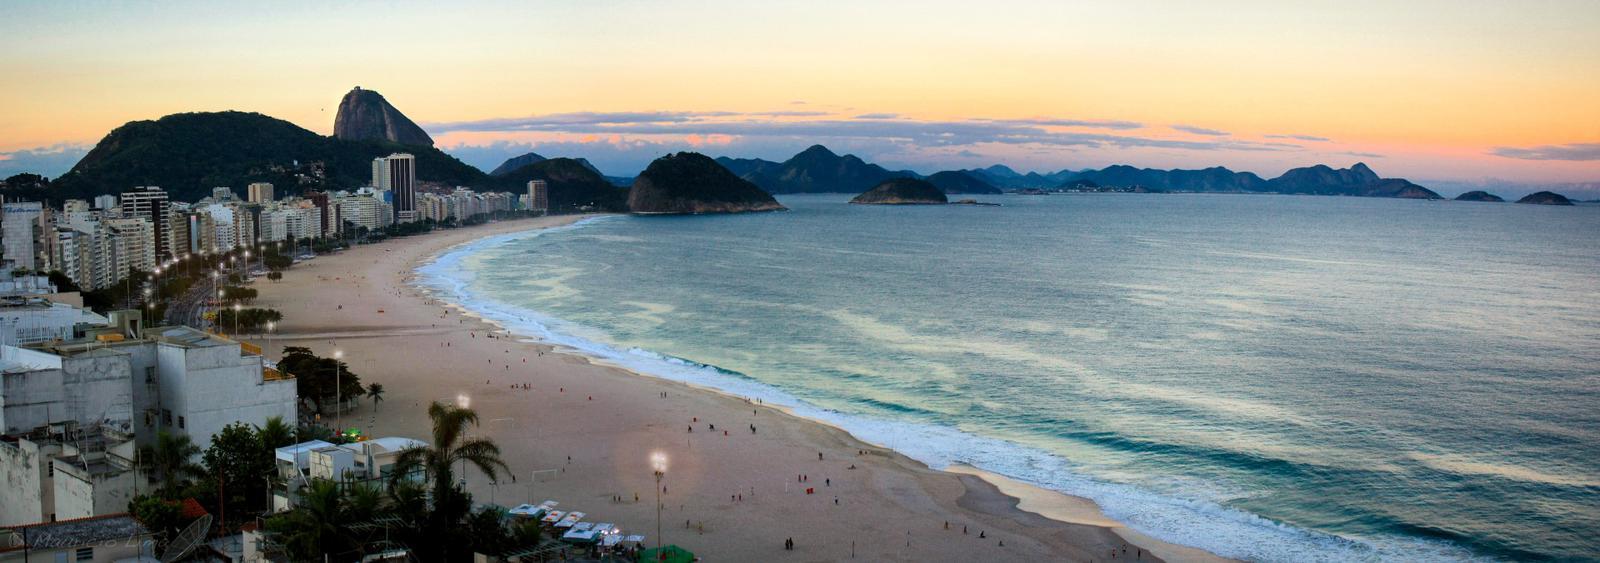 Copacabana CC Lima Pix